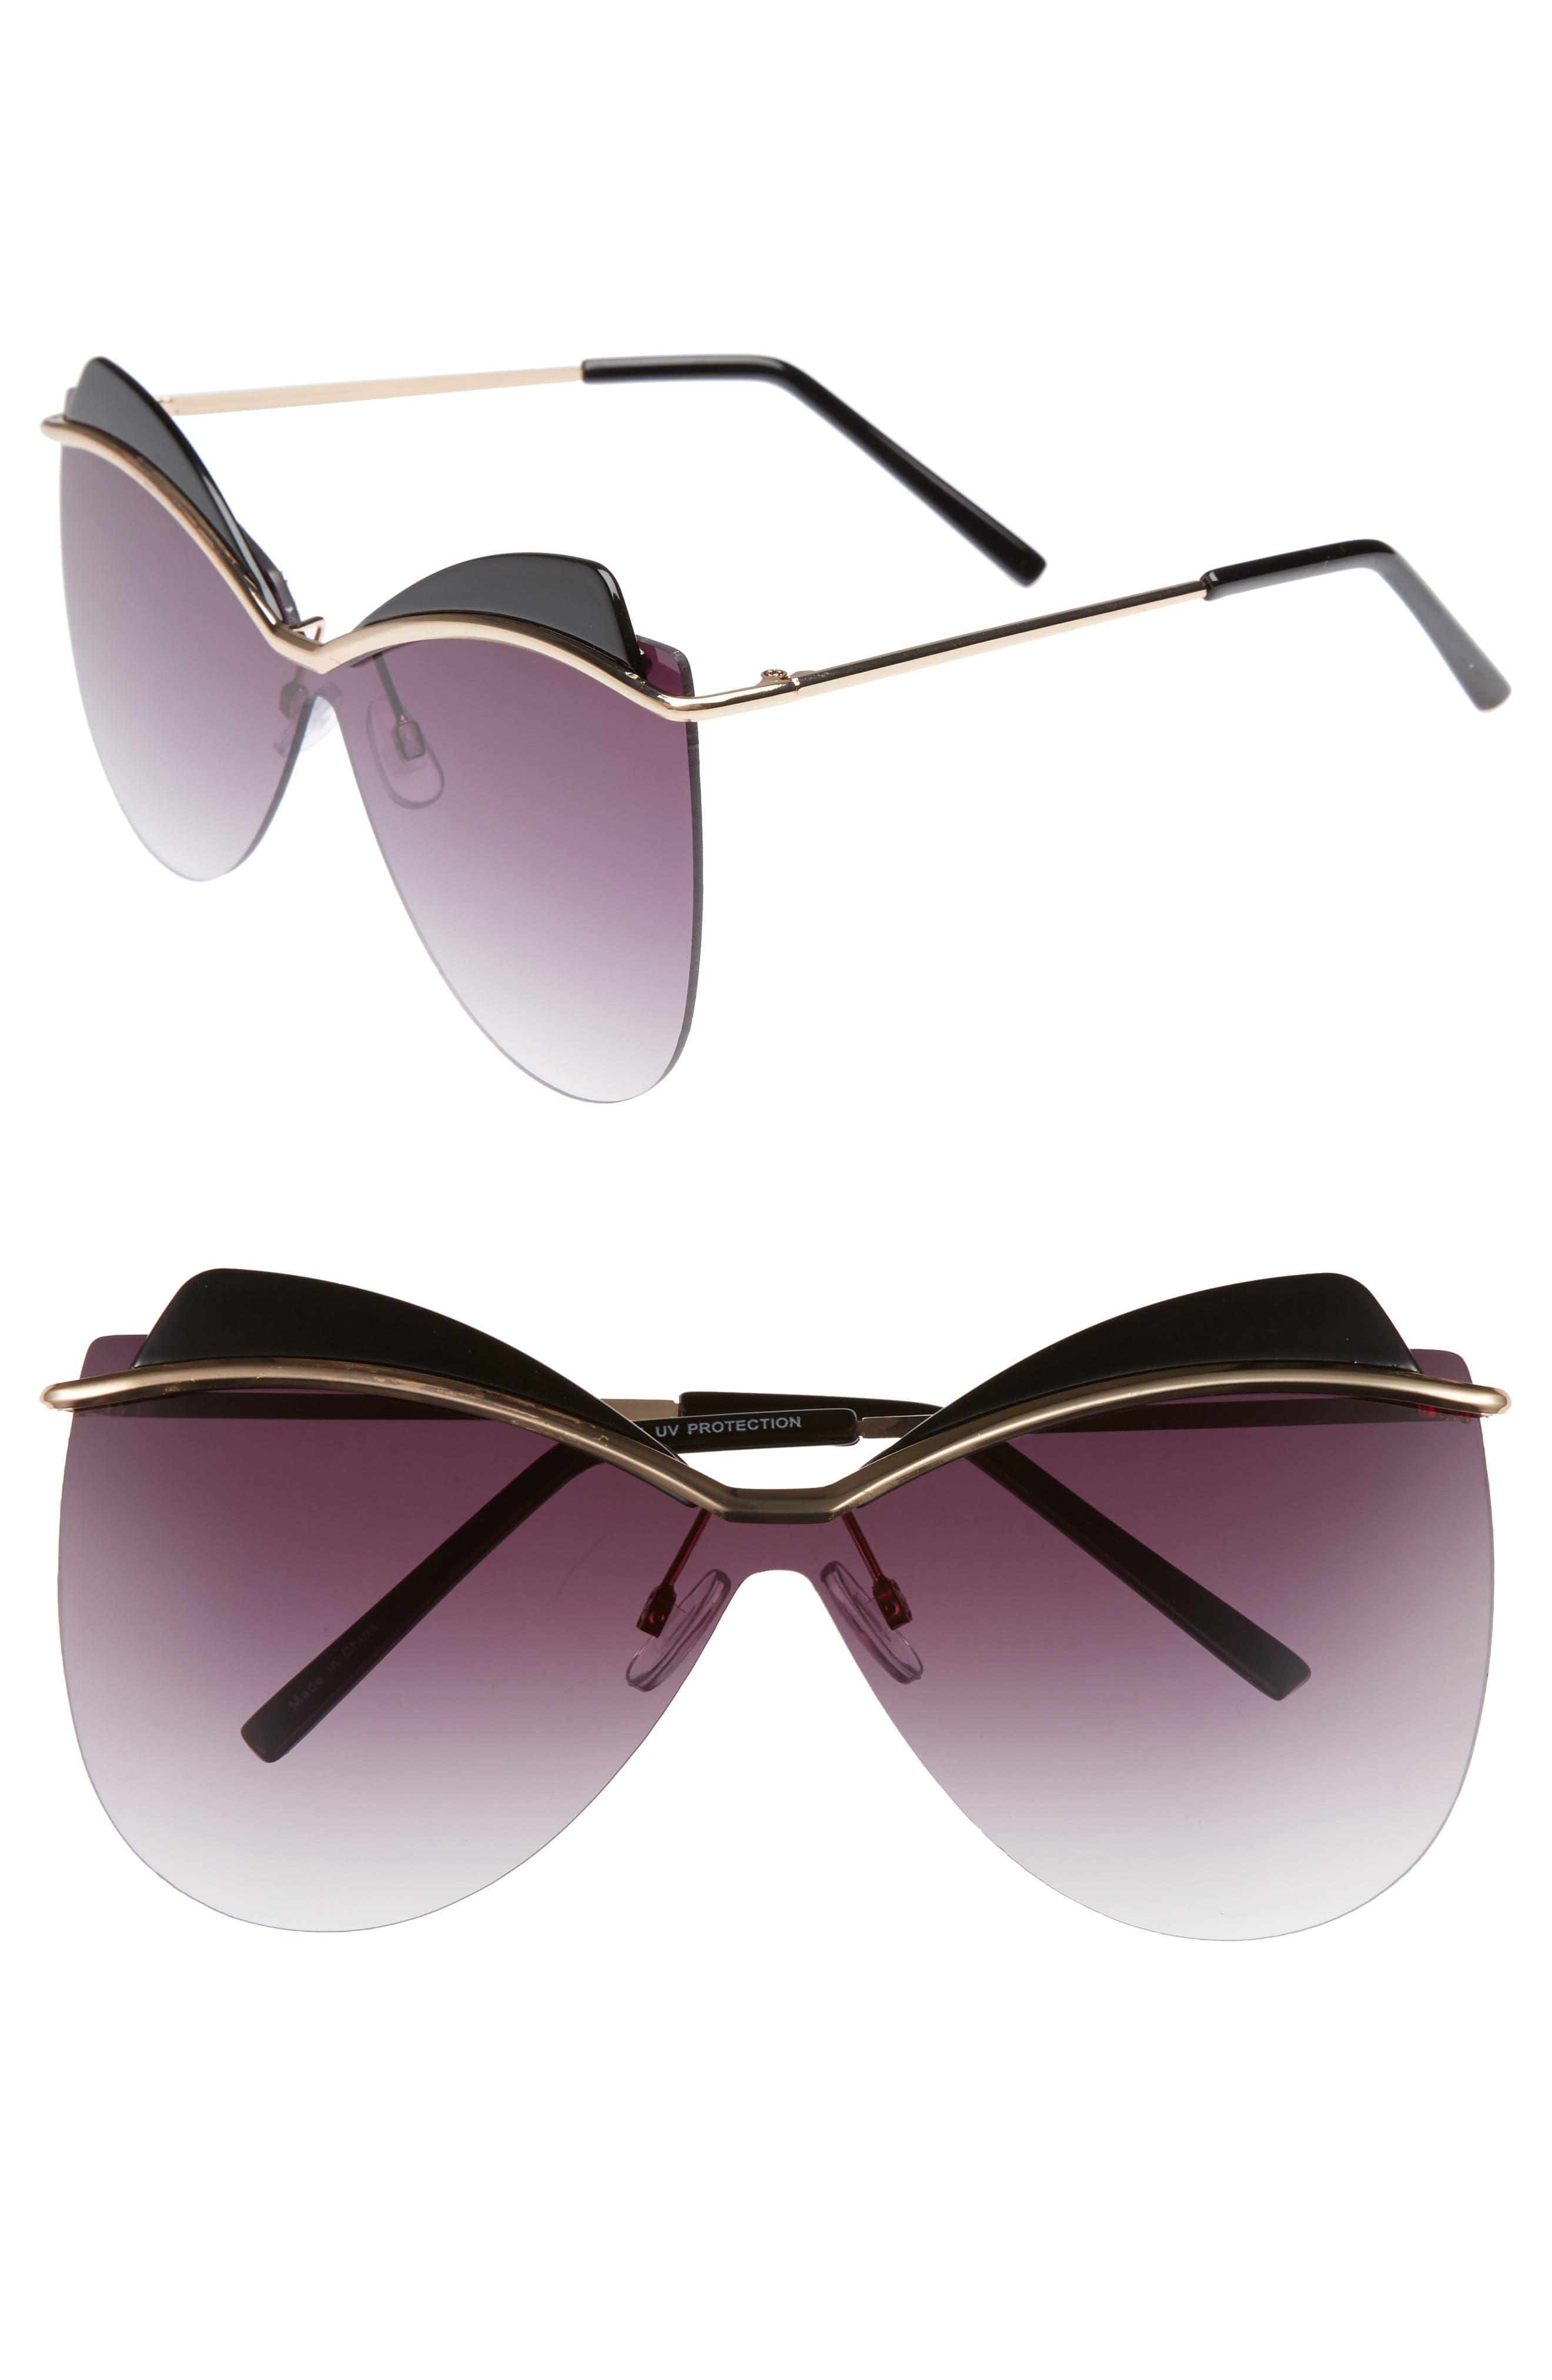 65mm Rimless Shield Sunglasses,                         Main,                         color, Black/ Gold